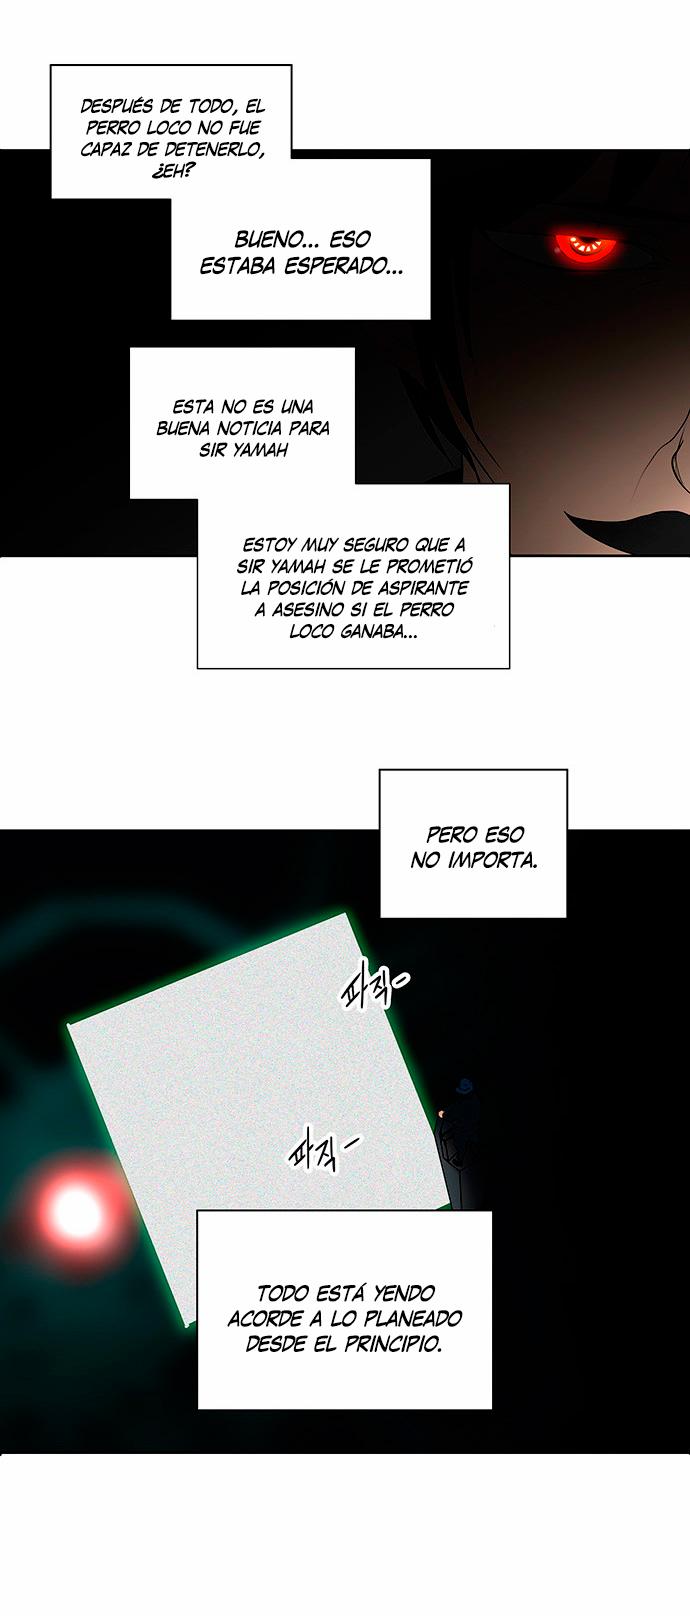 http://c5.ninemanga.com/es_manga/21/149/432509/6cbe986b041b57e3a1b492f5df823aff.jpg Page 8